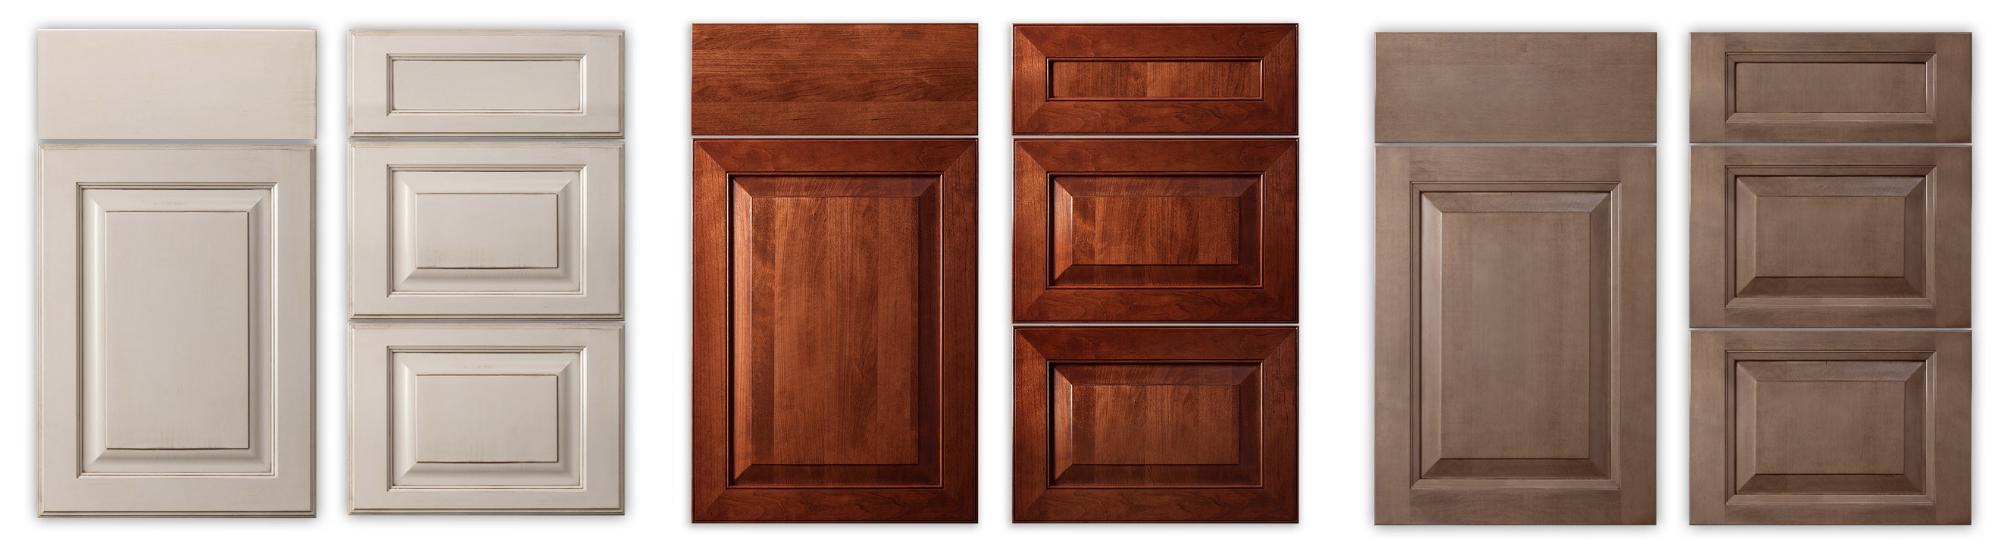 Raised Panel Cabinet Door Styles